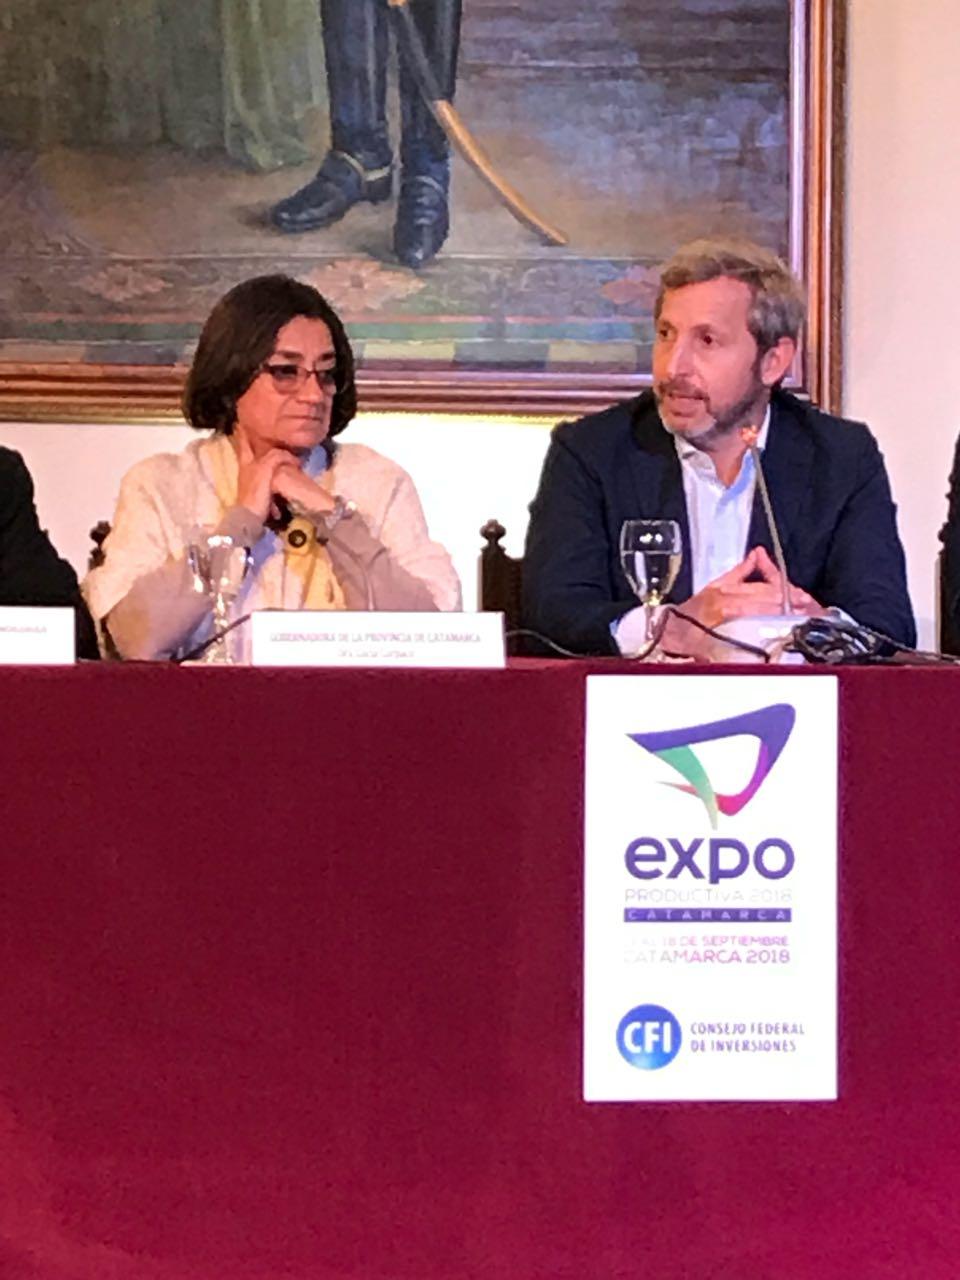 Presentación oficial de Expo Productiva en Buenos Aires